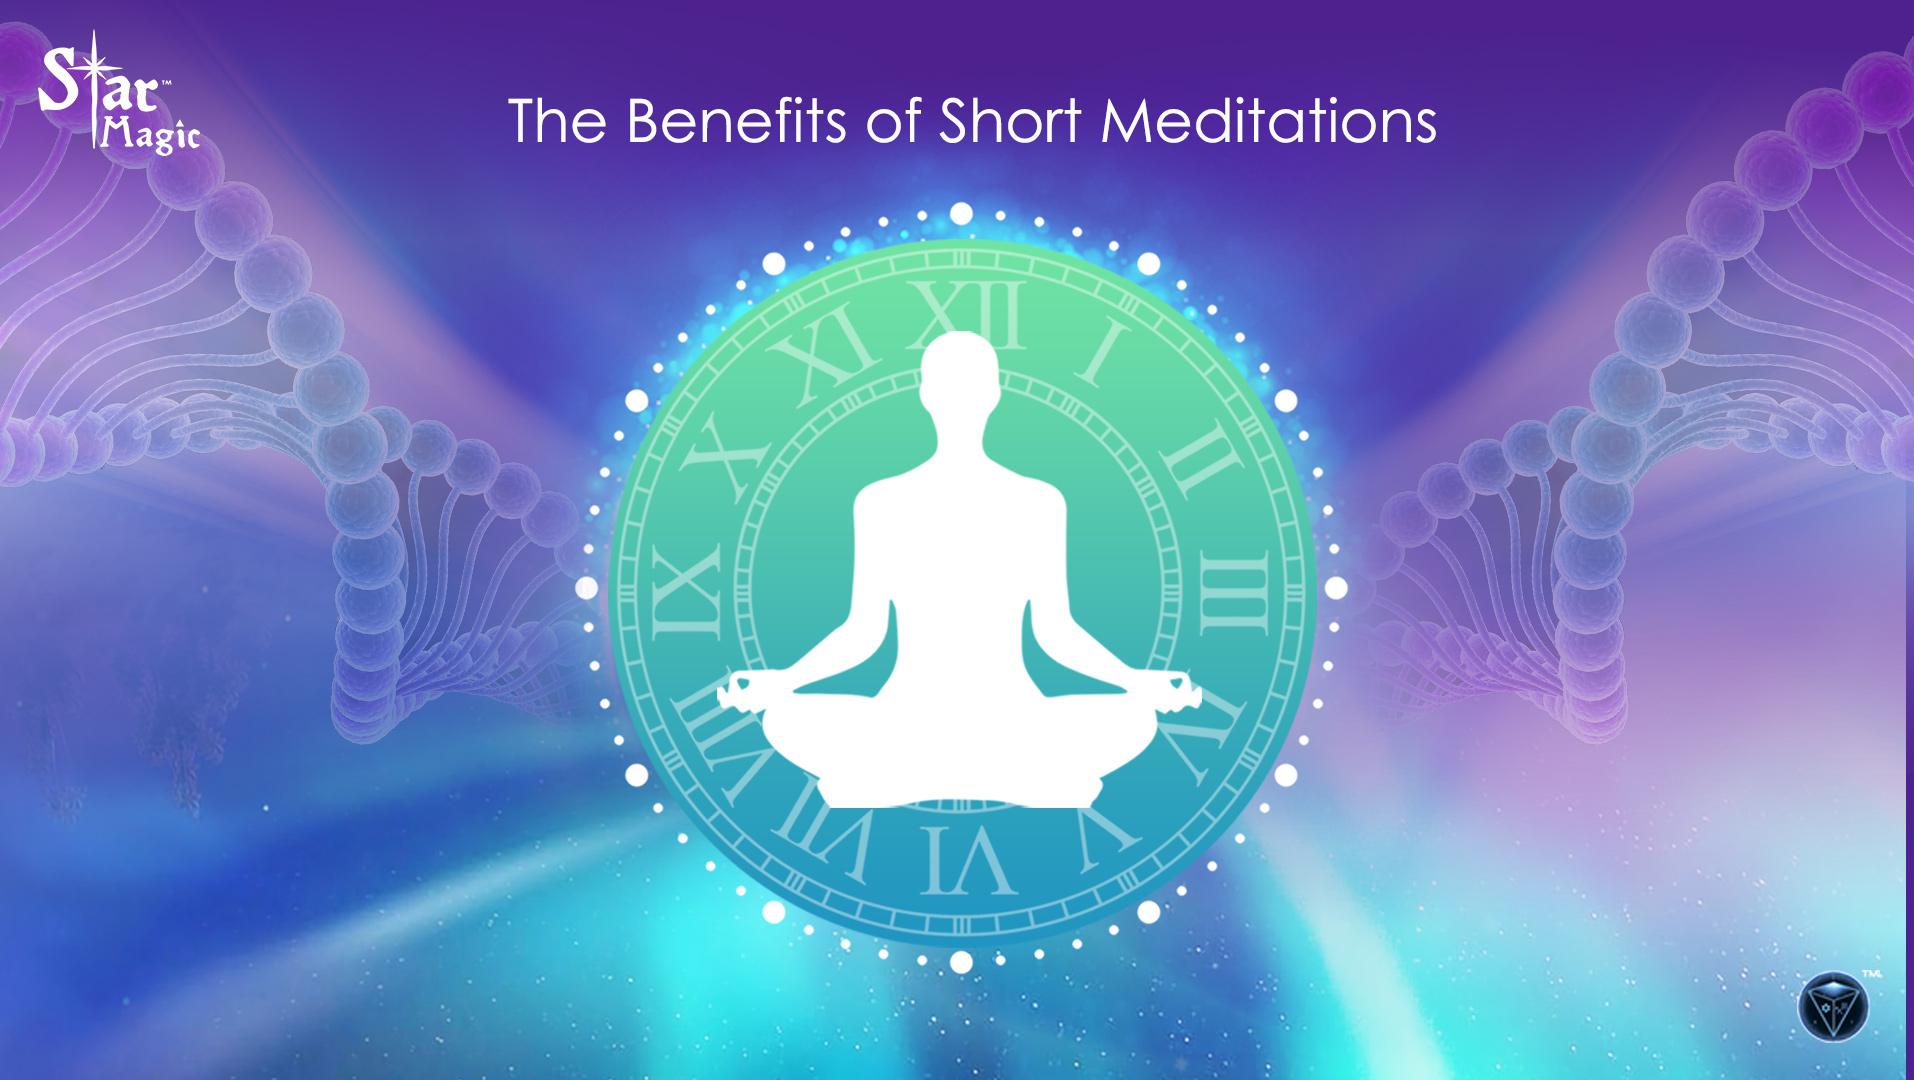 The Benefits of Short Meditations